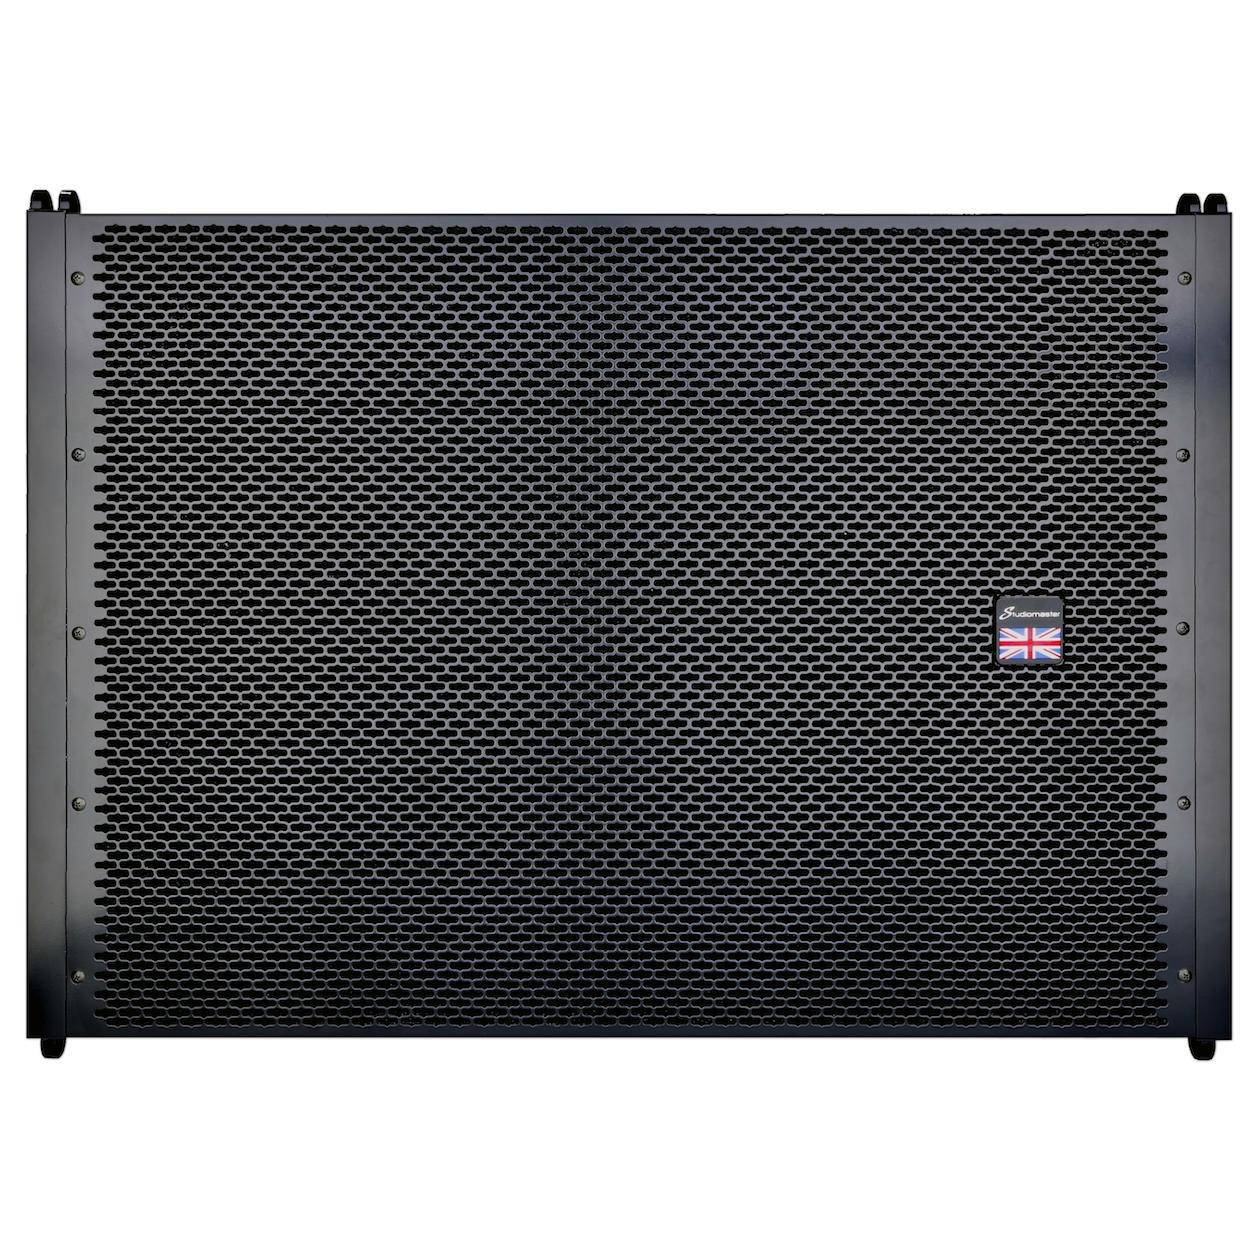 Studiomaster V10s Line array system front view